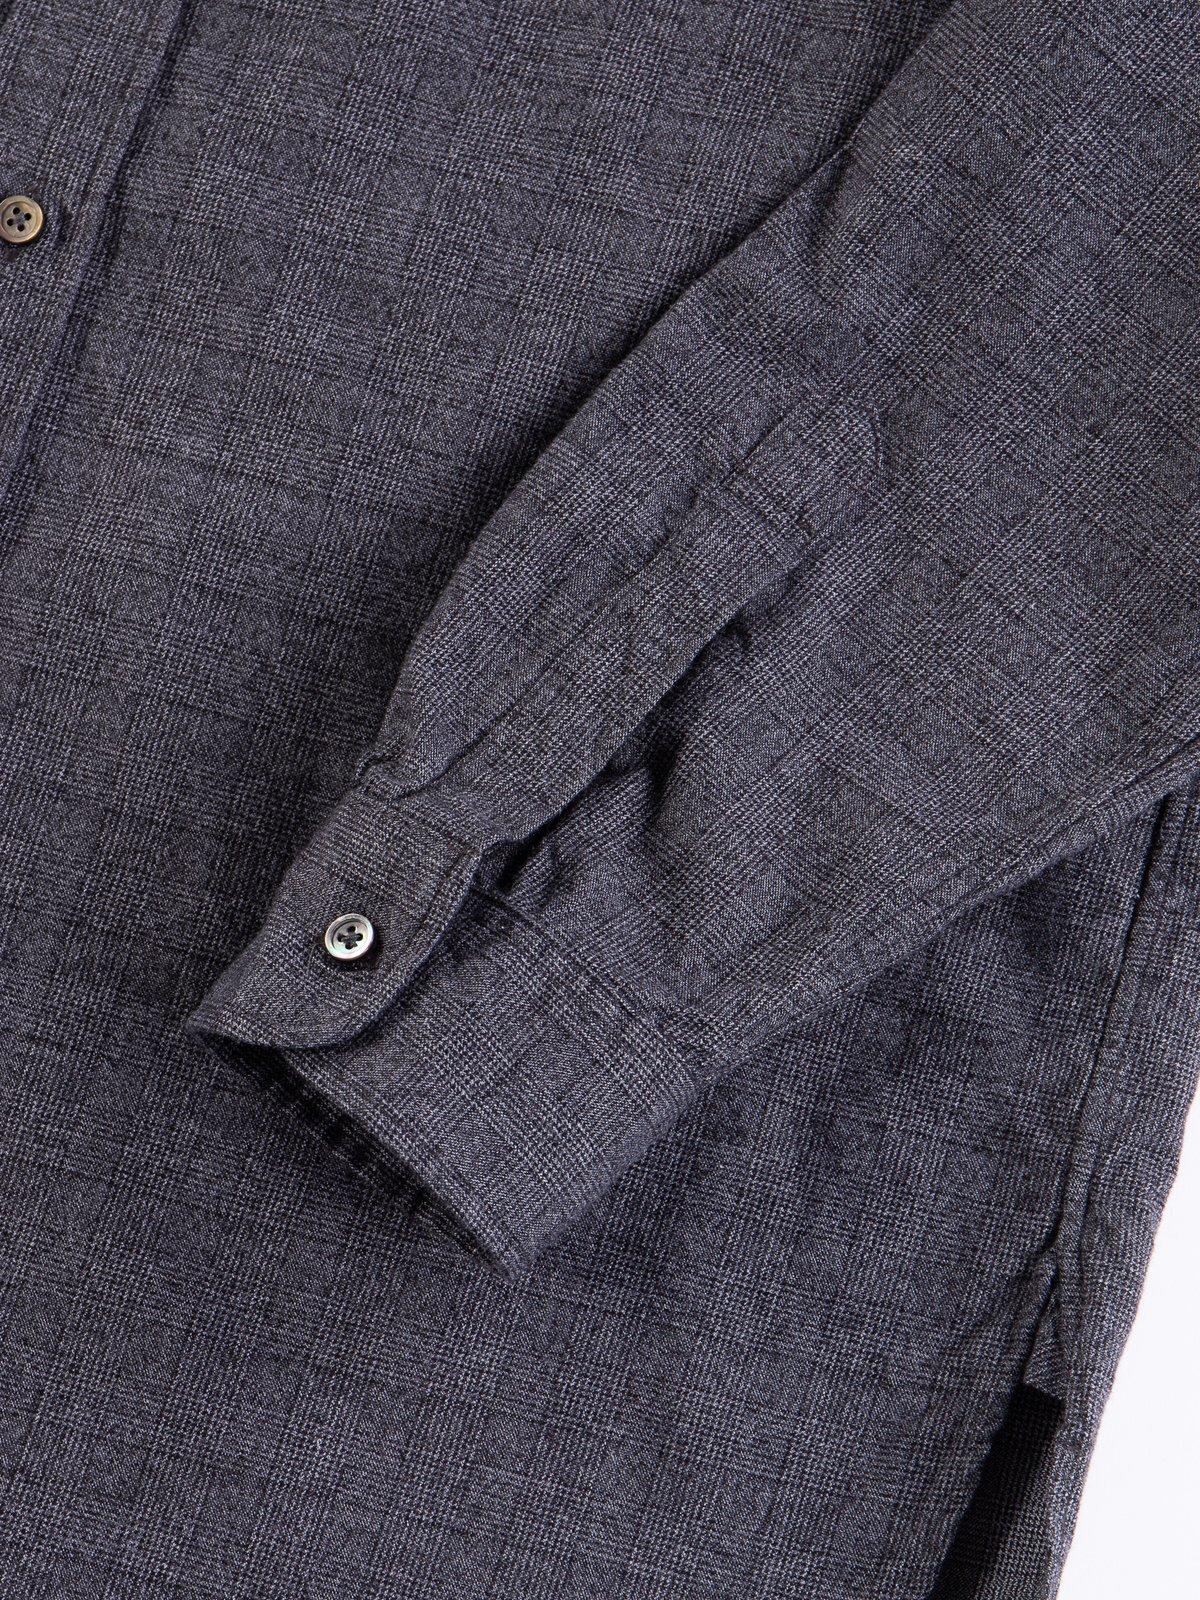 Grey Cotton Glen Plaid 19th Century BD Shirt - Image 4